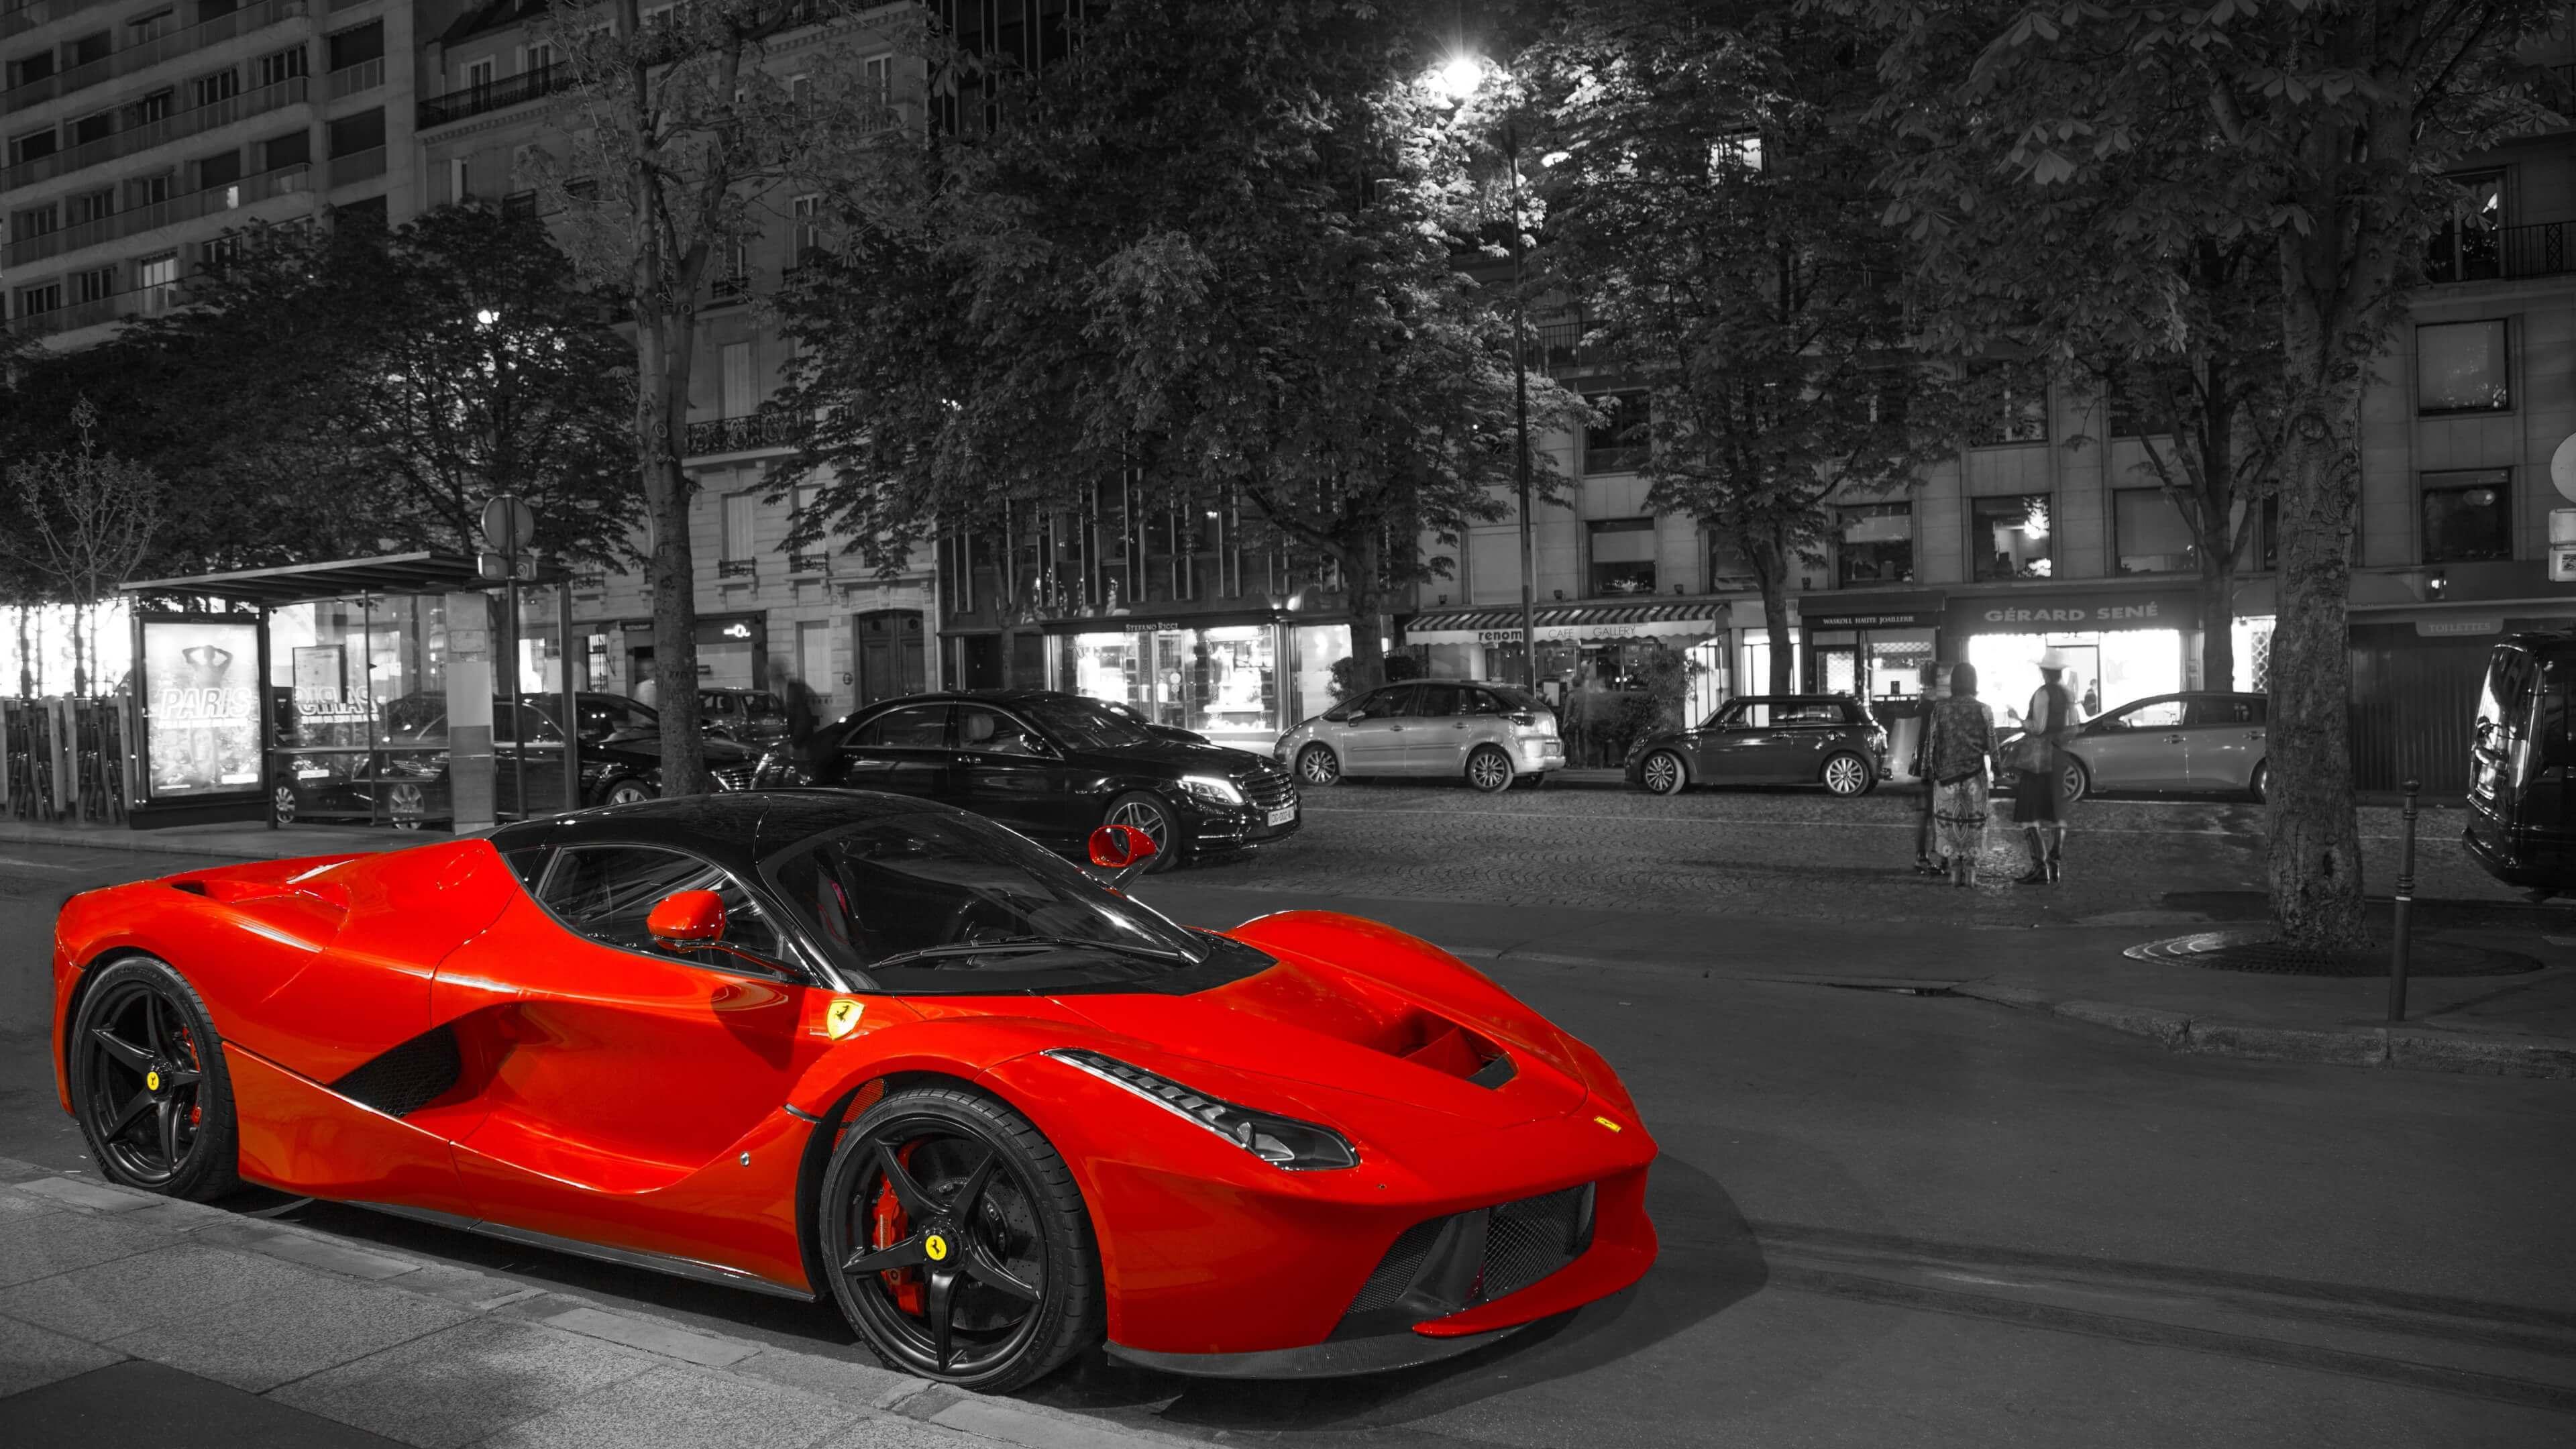 Ferrari LaFerrari Red Supercar 4K Wallpaper 3840x2160